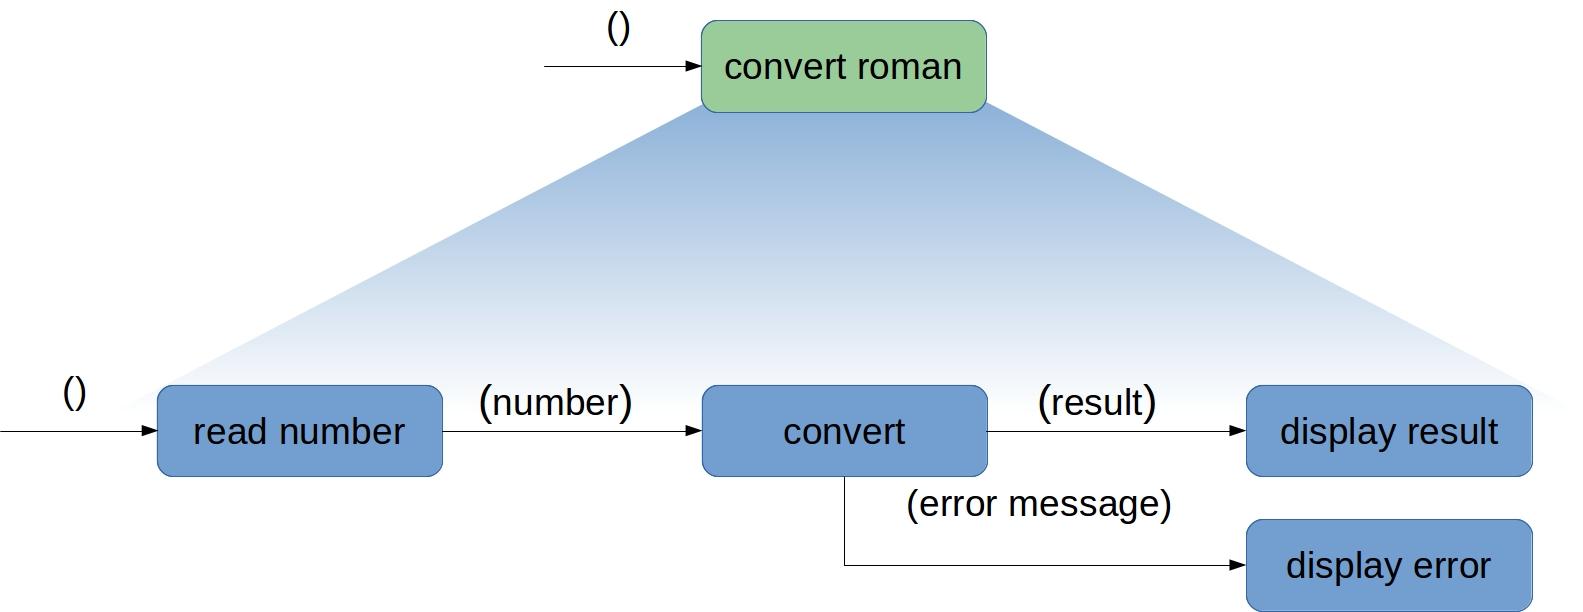 Oberste Funktionseinheit convert-roman. (Abb. 3)